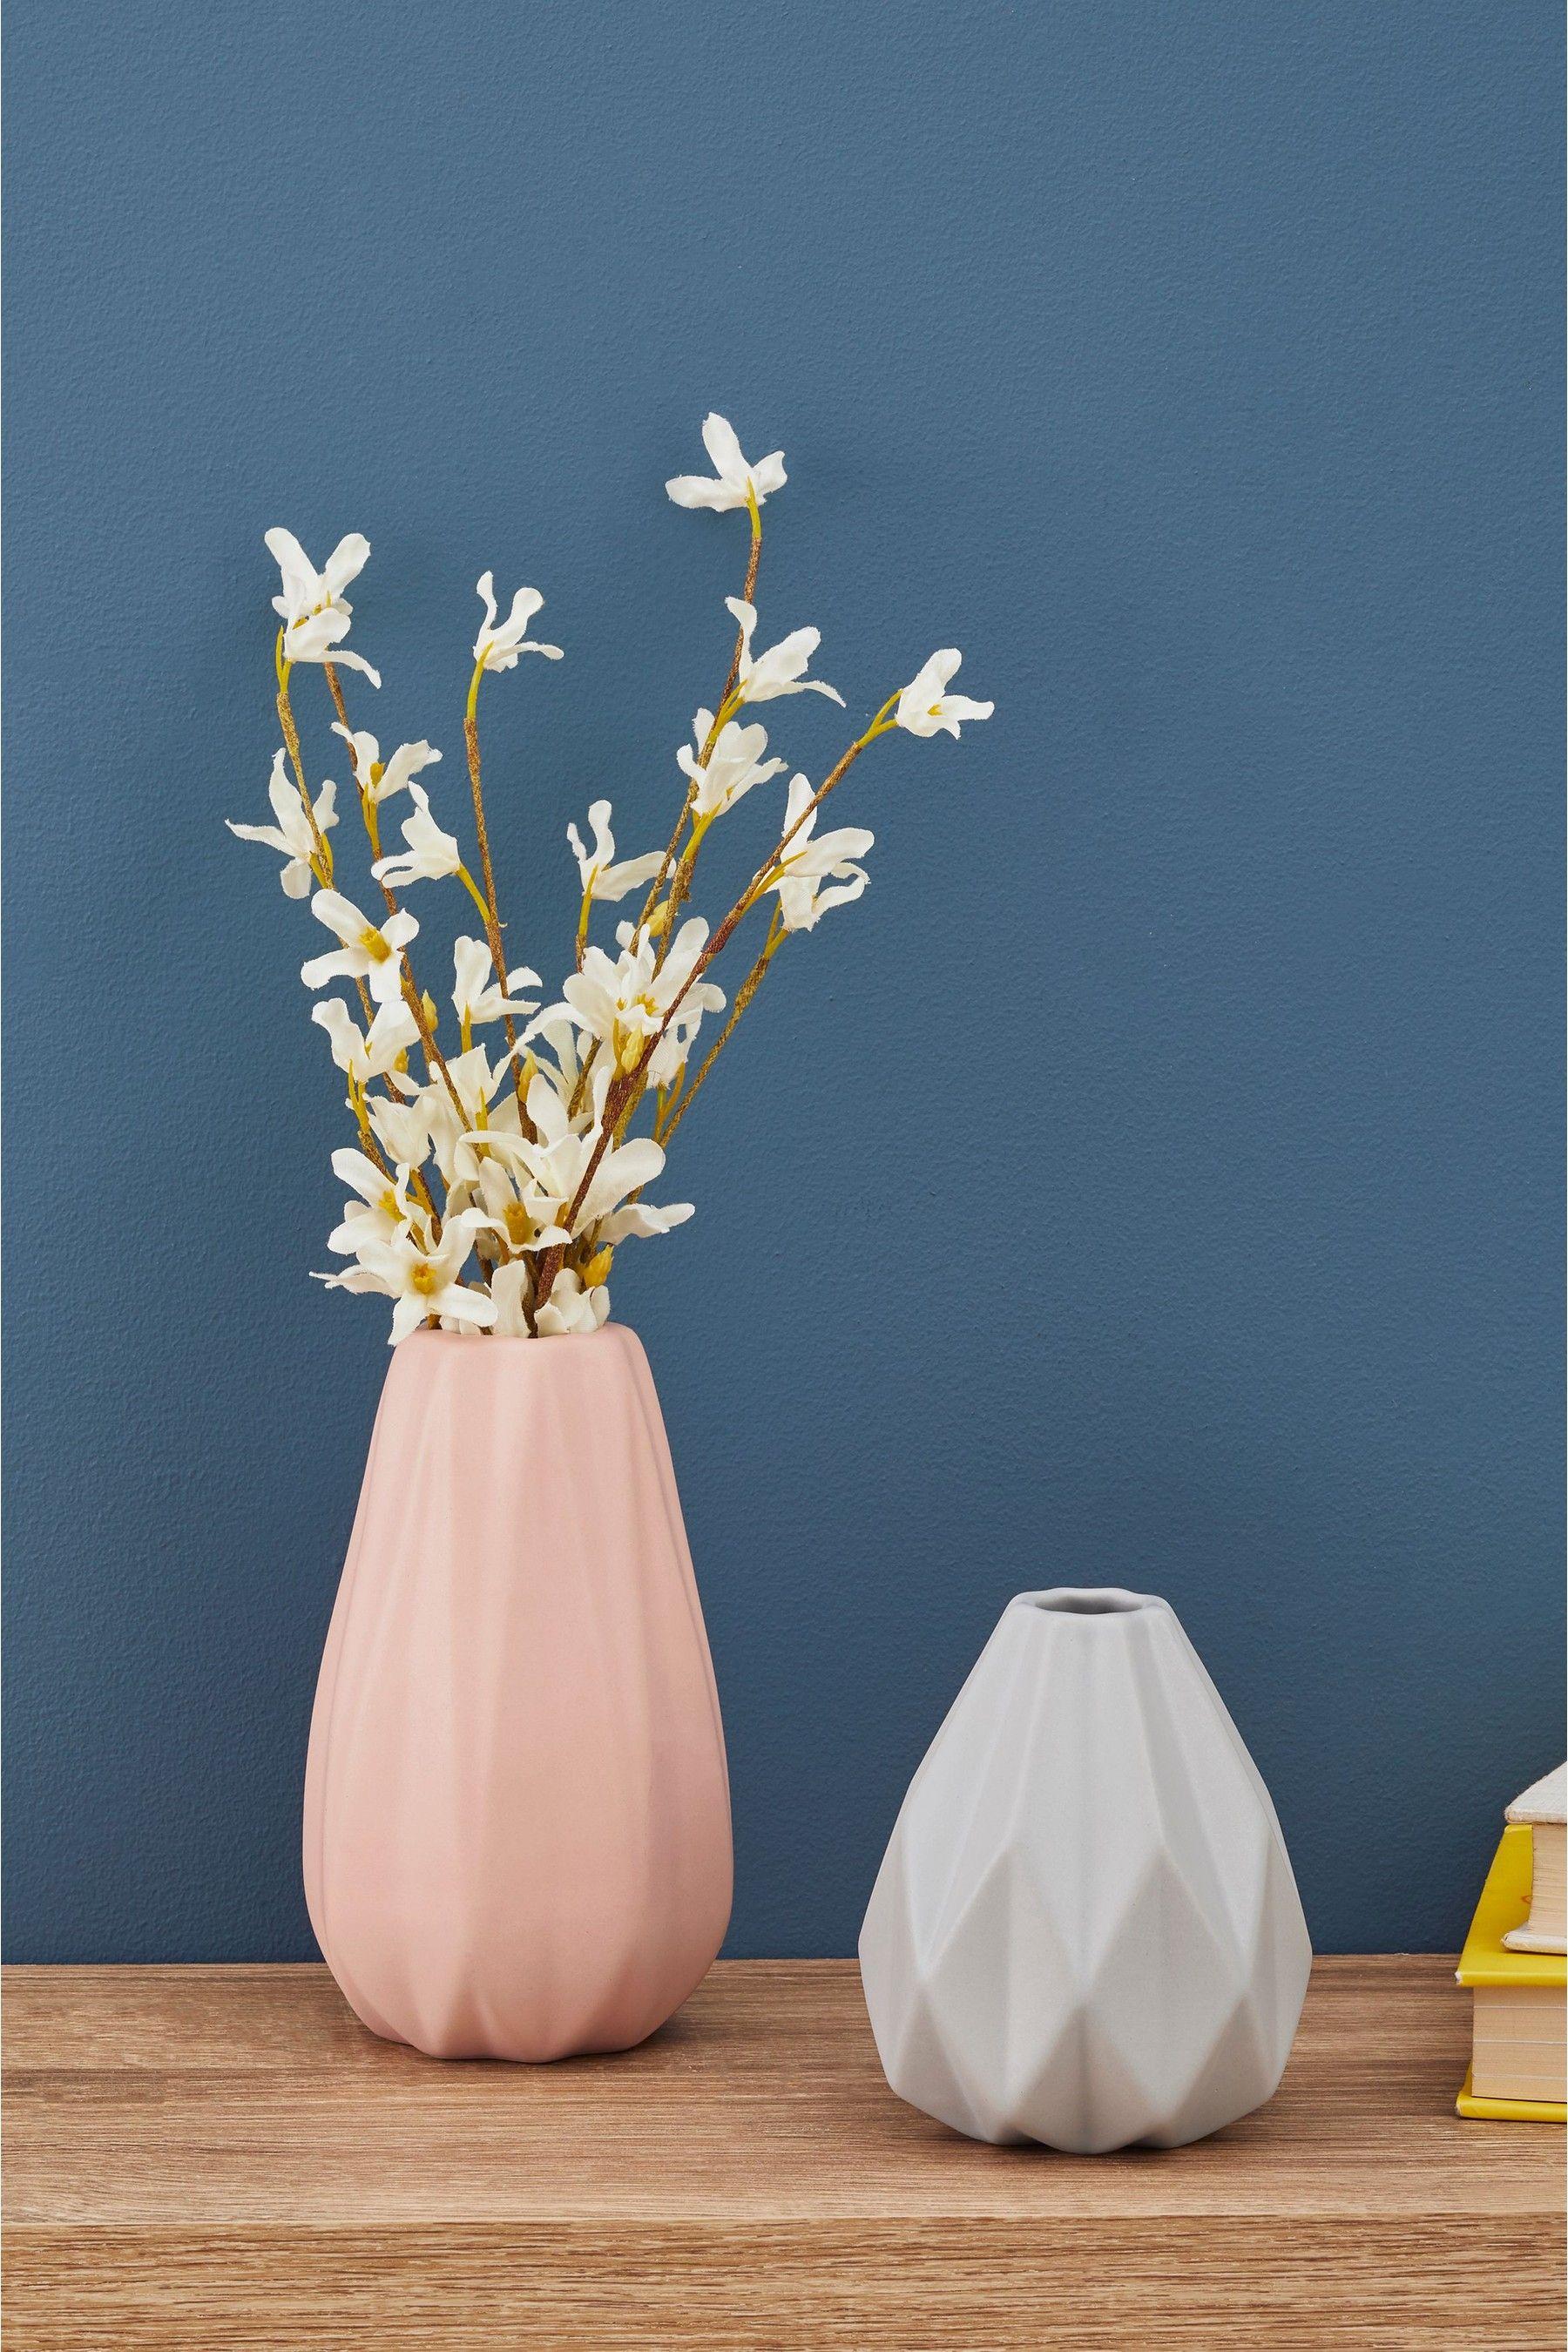 Next Set Of 2 Pleated Vases Pink Diy Vase Vase Home Decor Wall Art